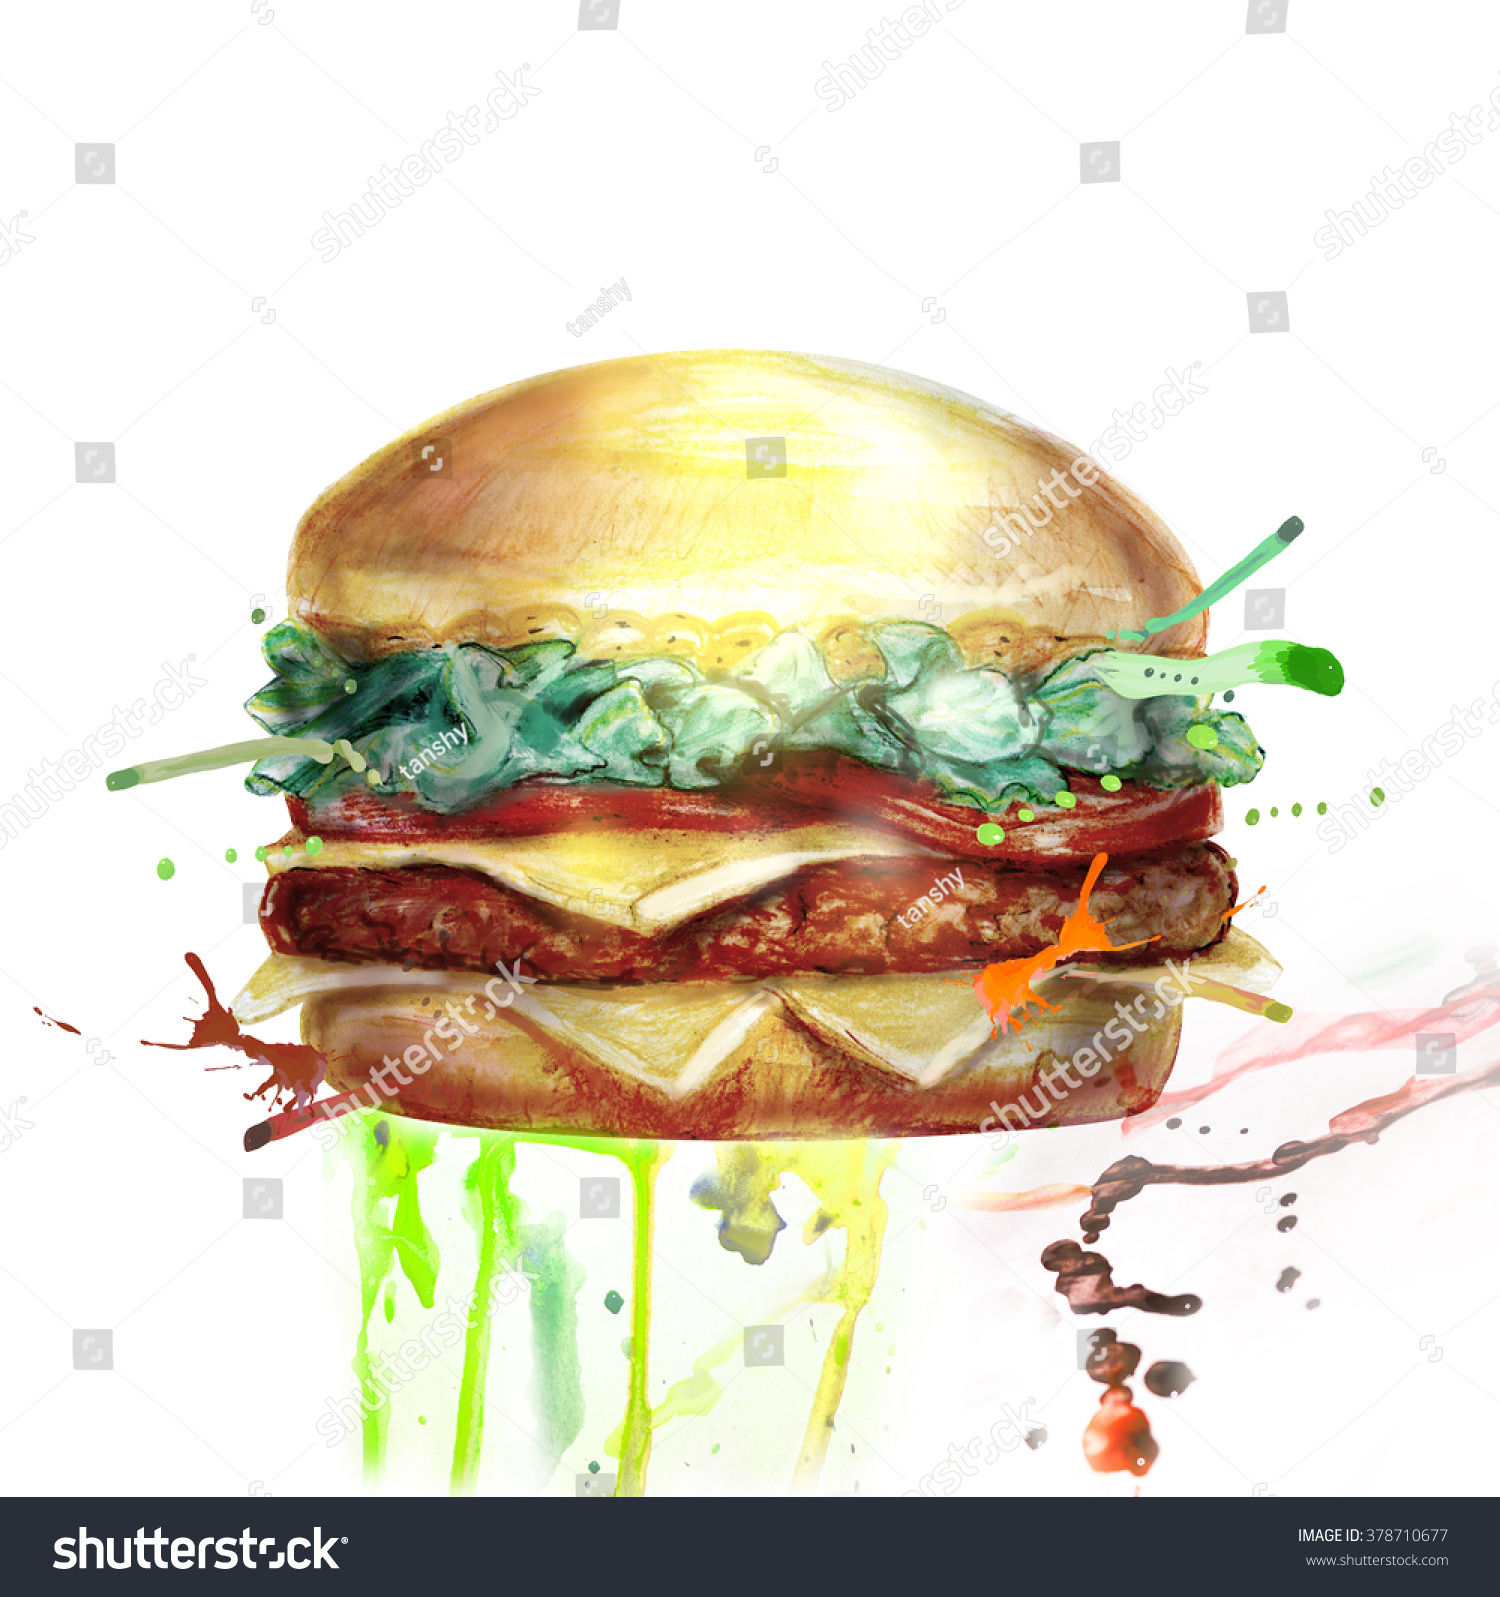 Hamburger painting illustration photo